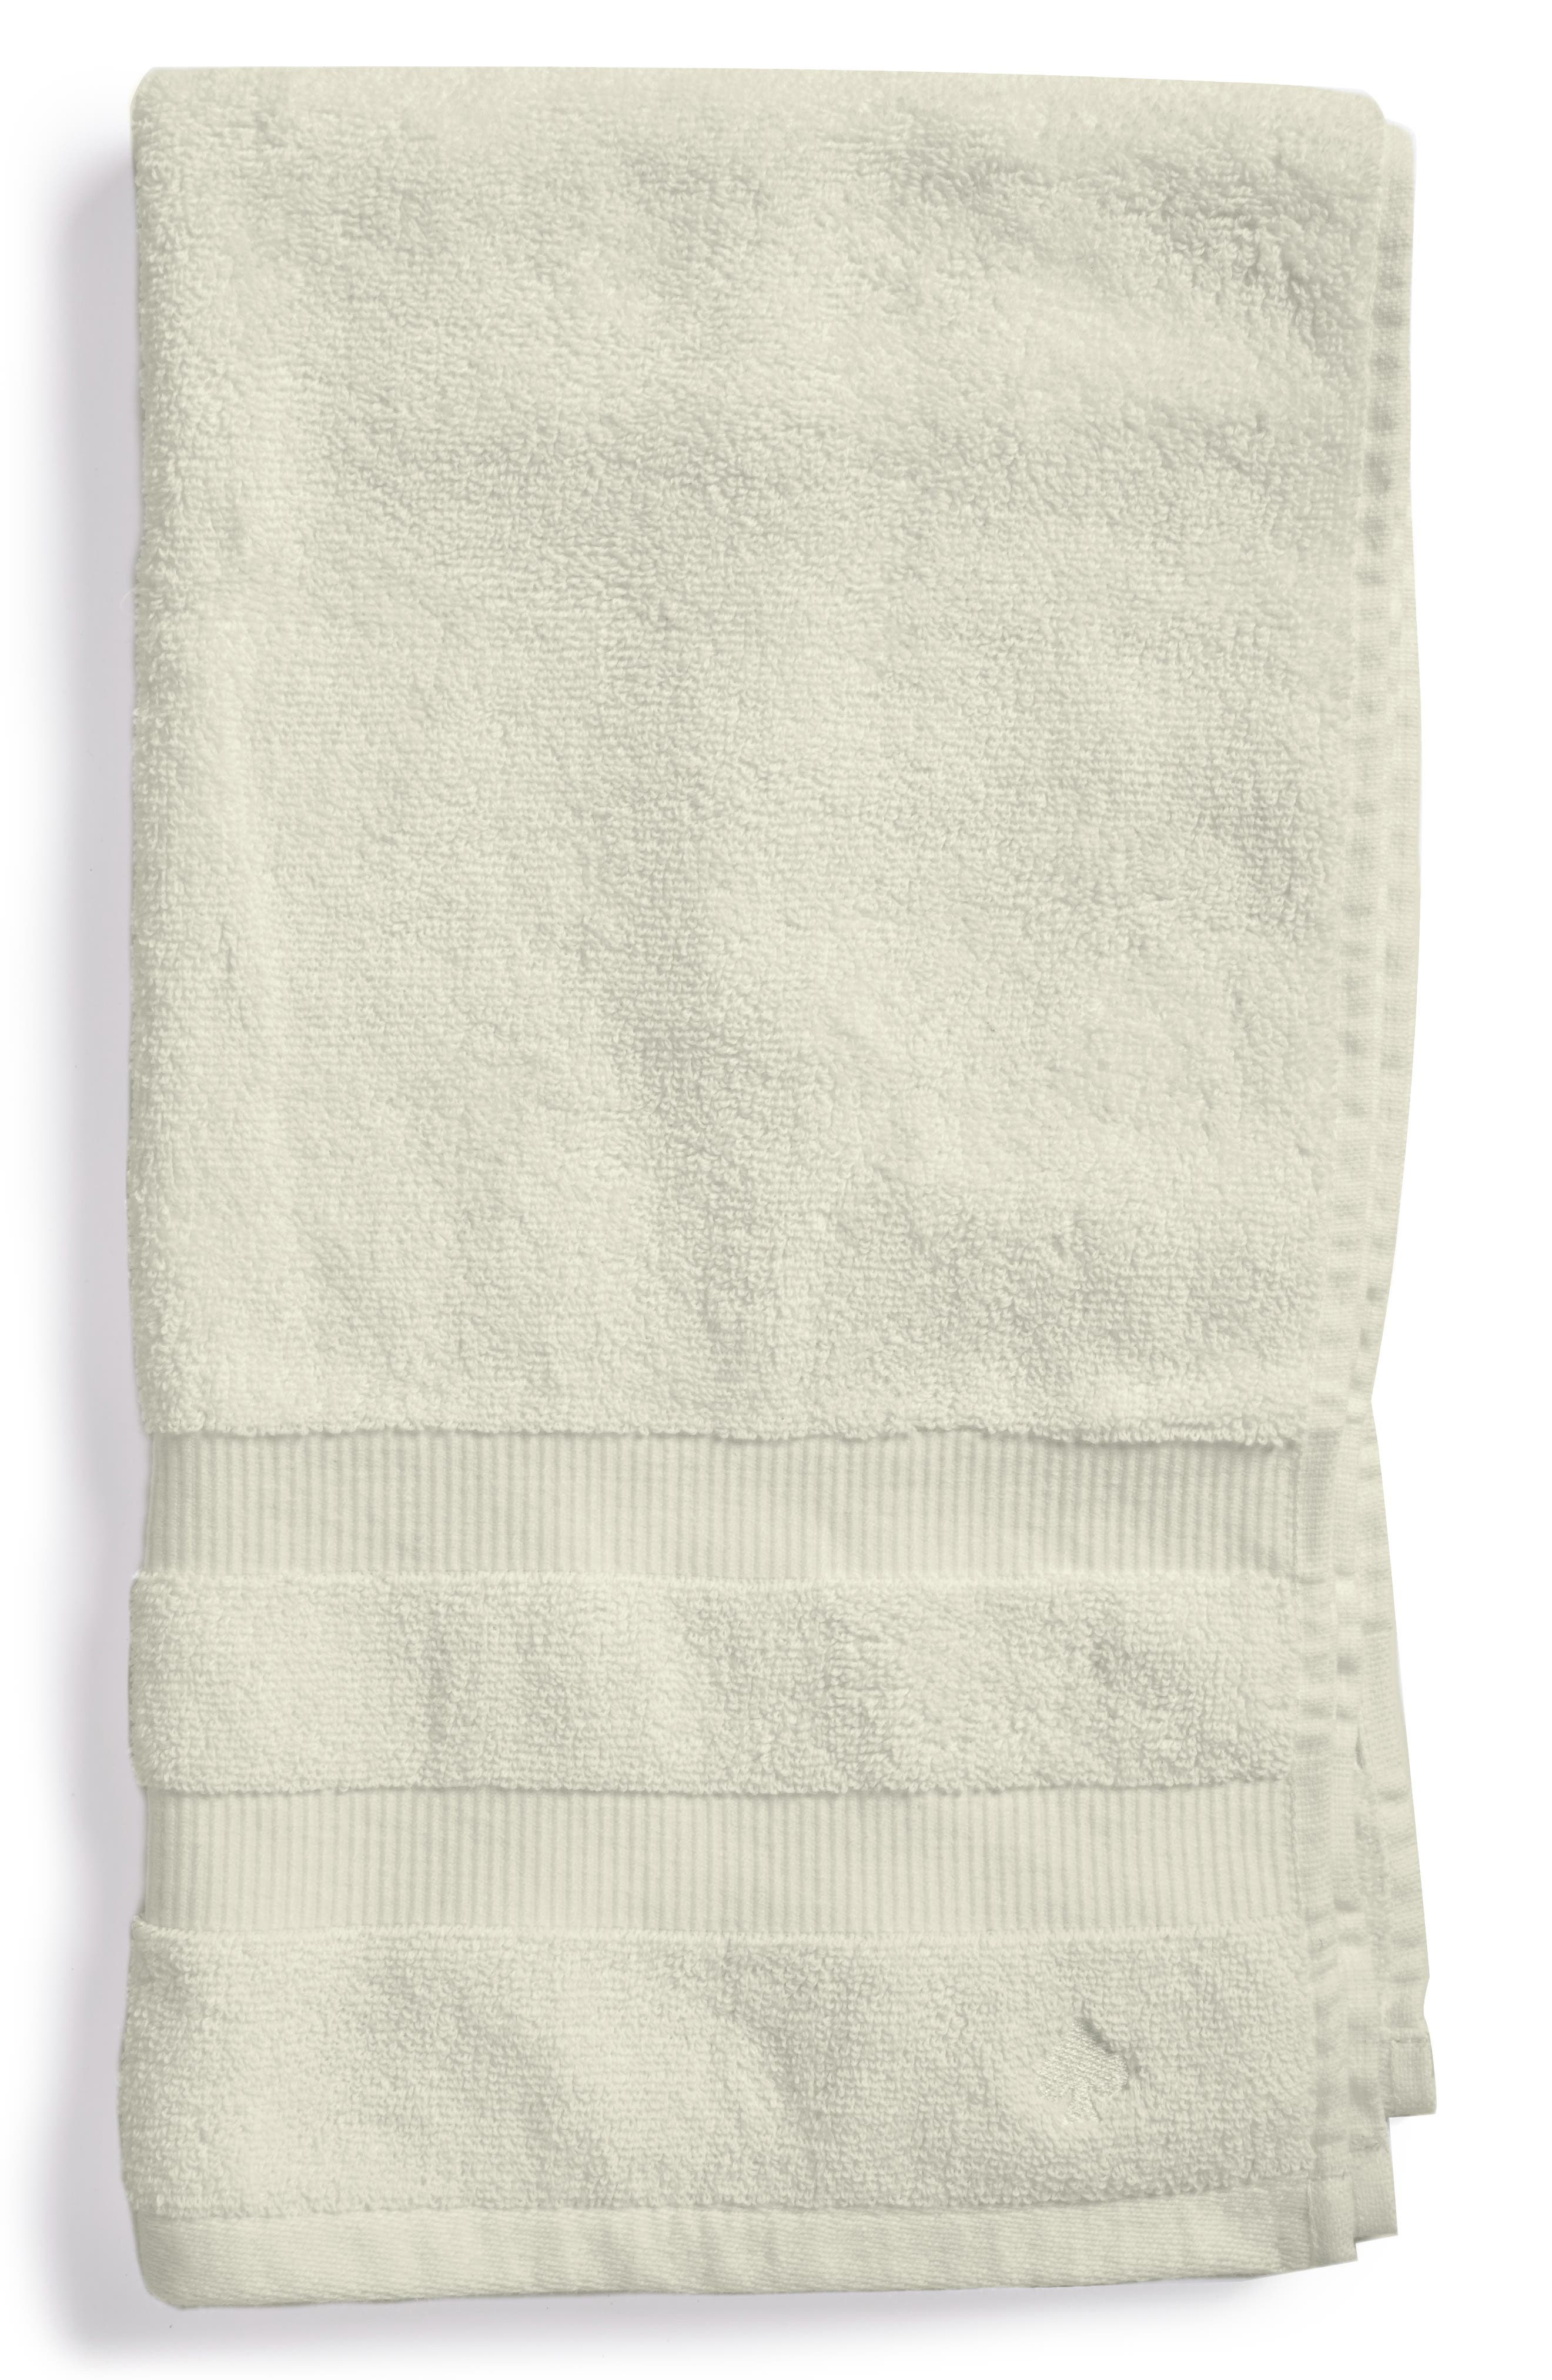 'chattam' stripe hand towel,                             Main thumbnail 1, color,                             040